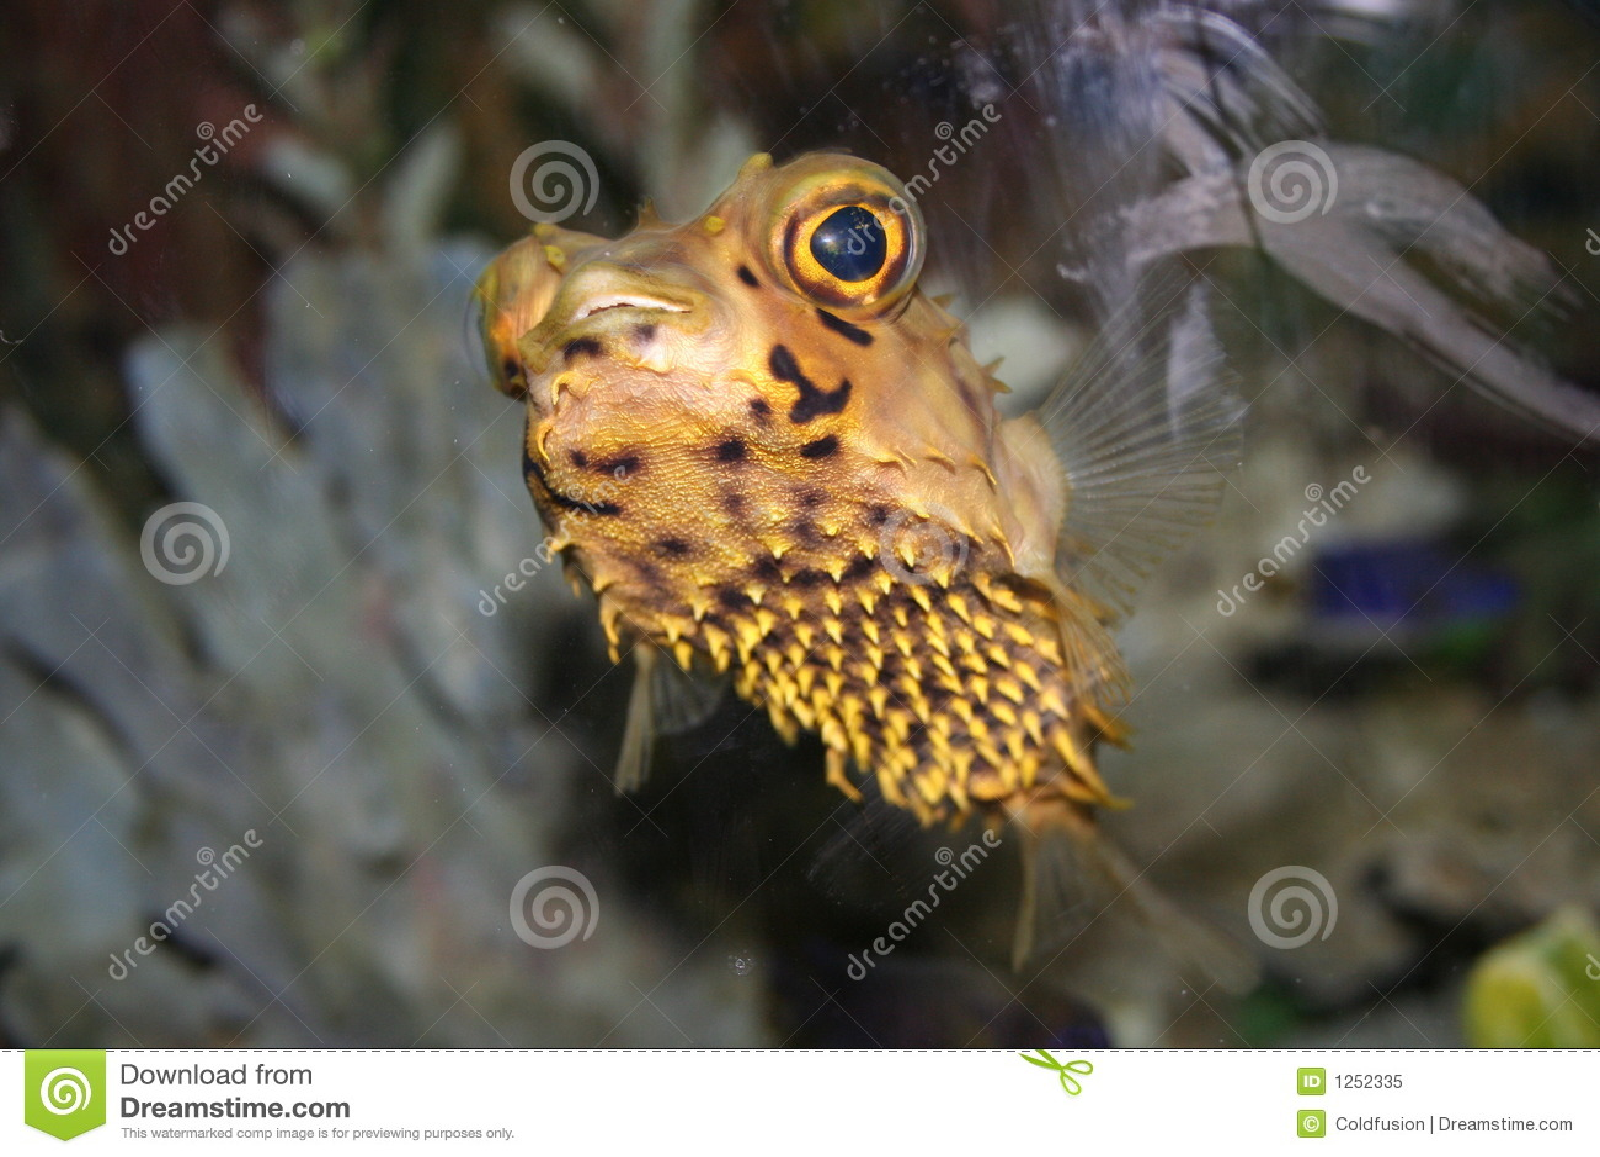 smiling Tropical Fish - Hedgehog , Diodon